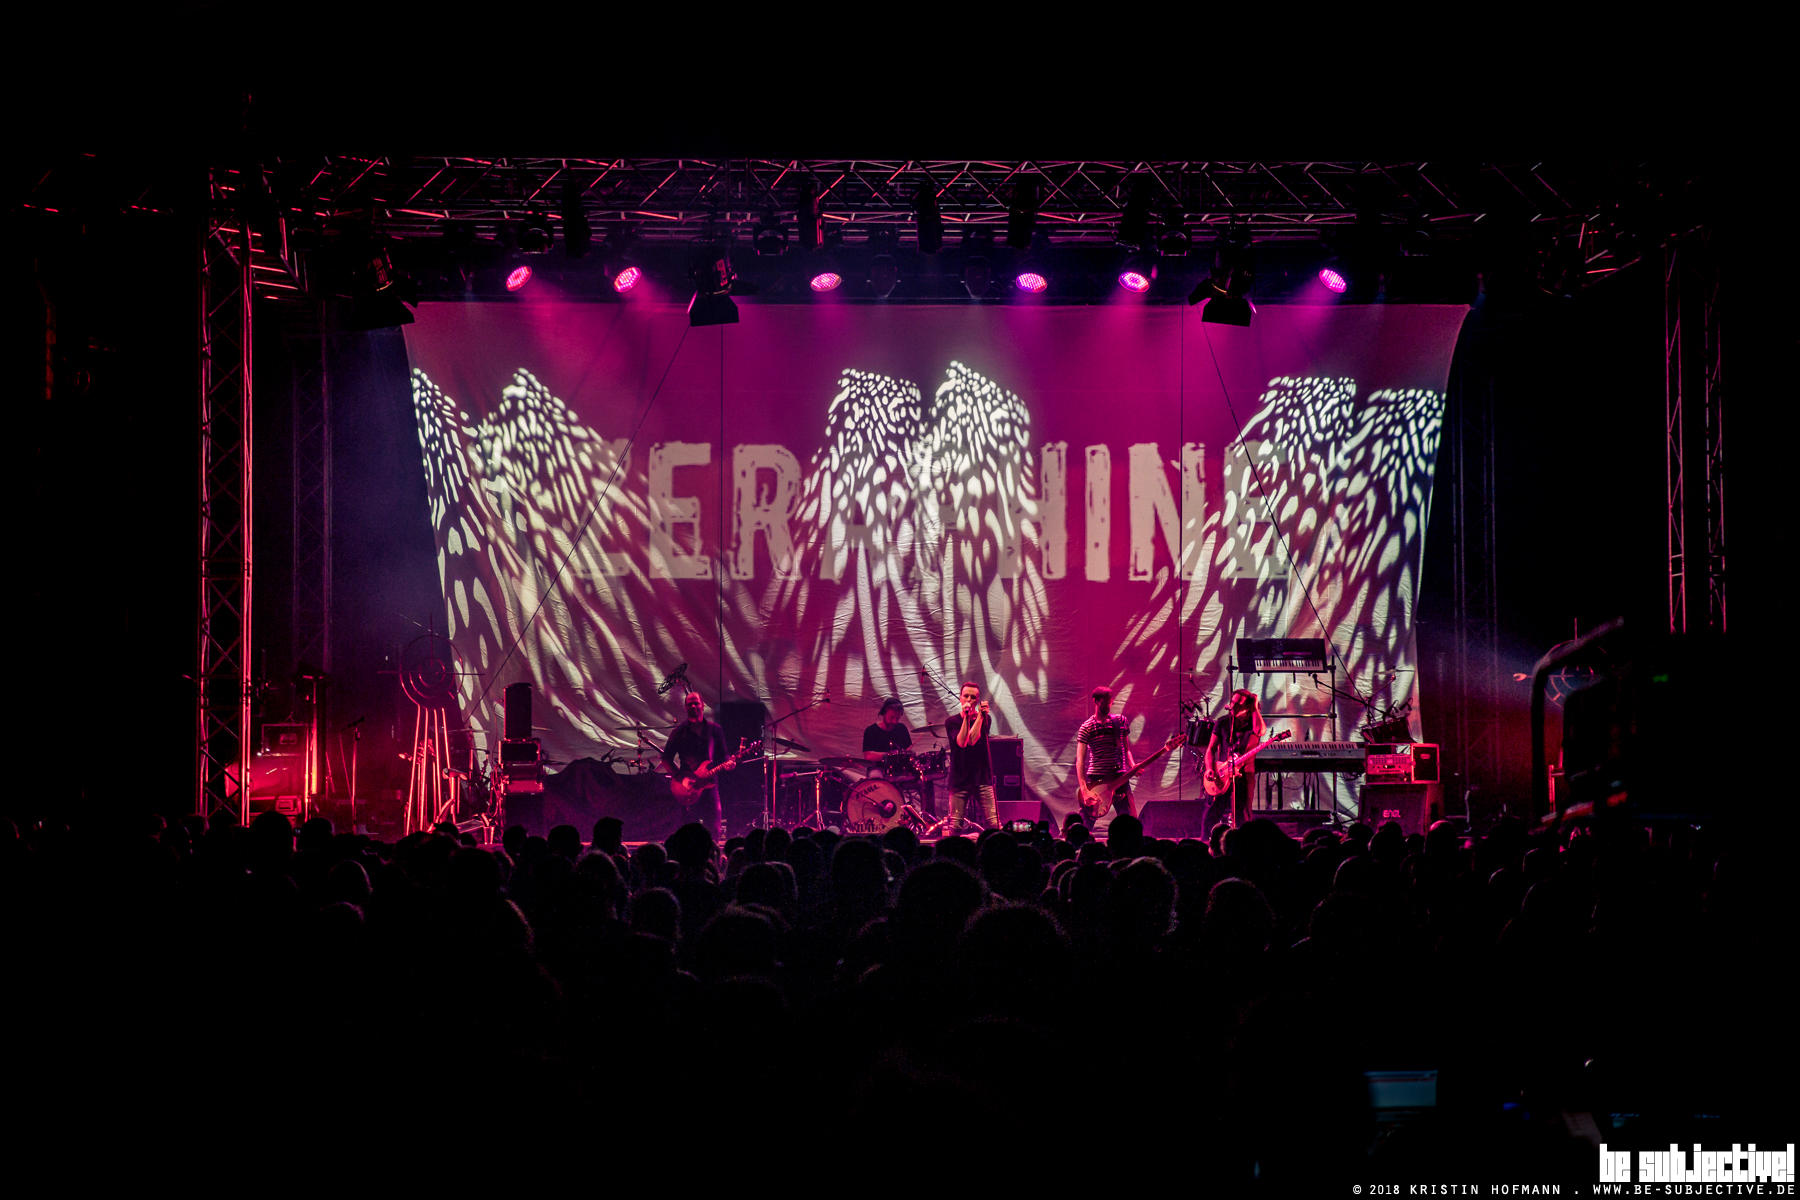 Zeraphine (Foto: Kristin Hofmann bs! 2018)